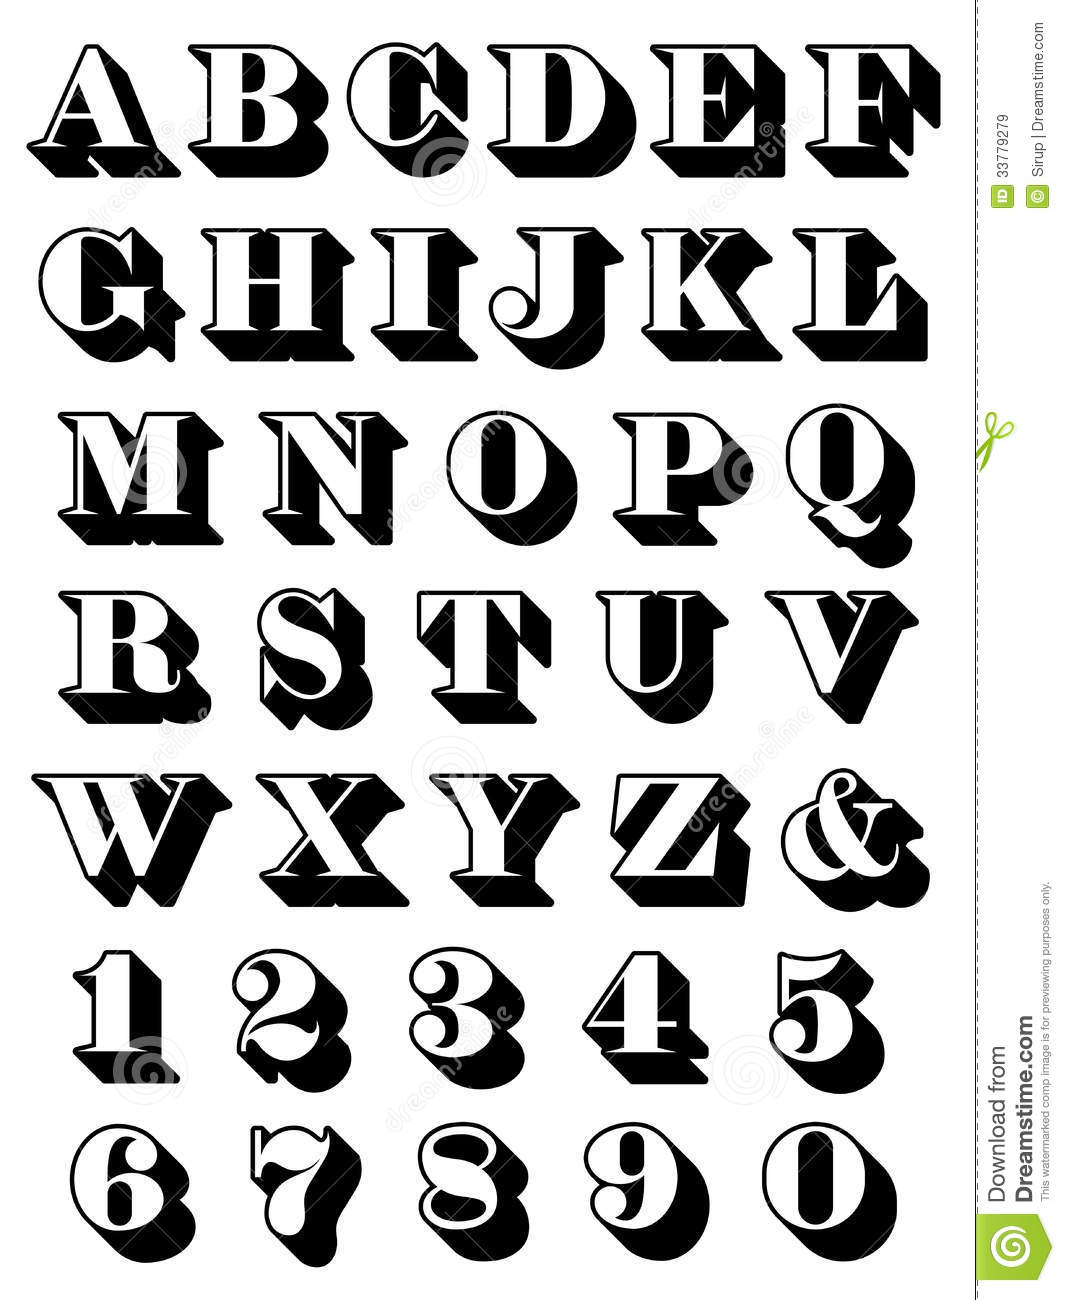 Ebook] Alphabet Francais Majuscule destiné Alphabet Français À Imprimer